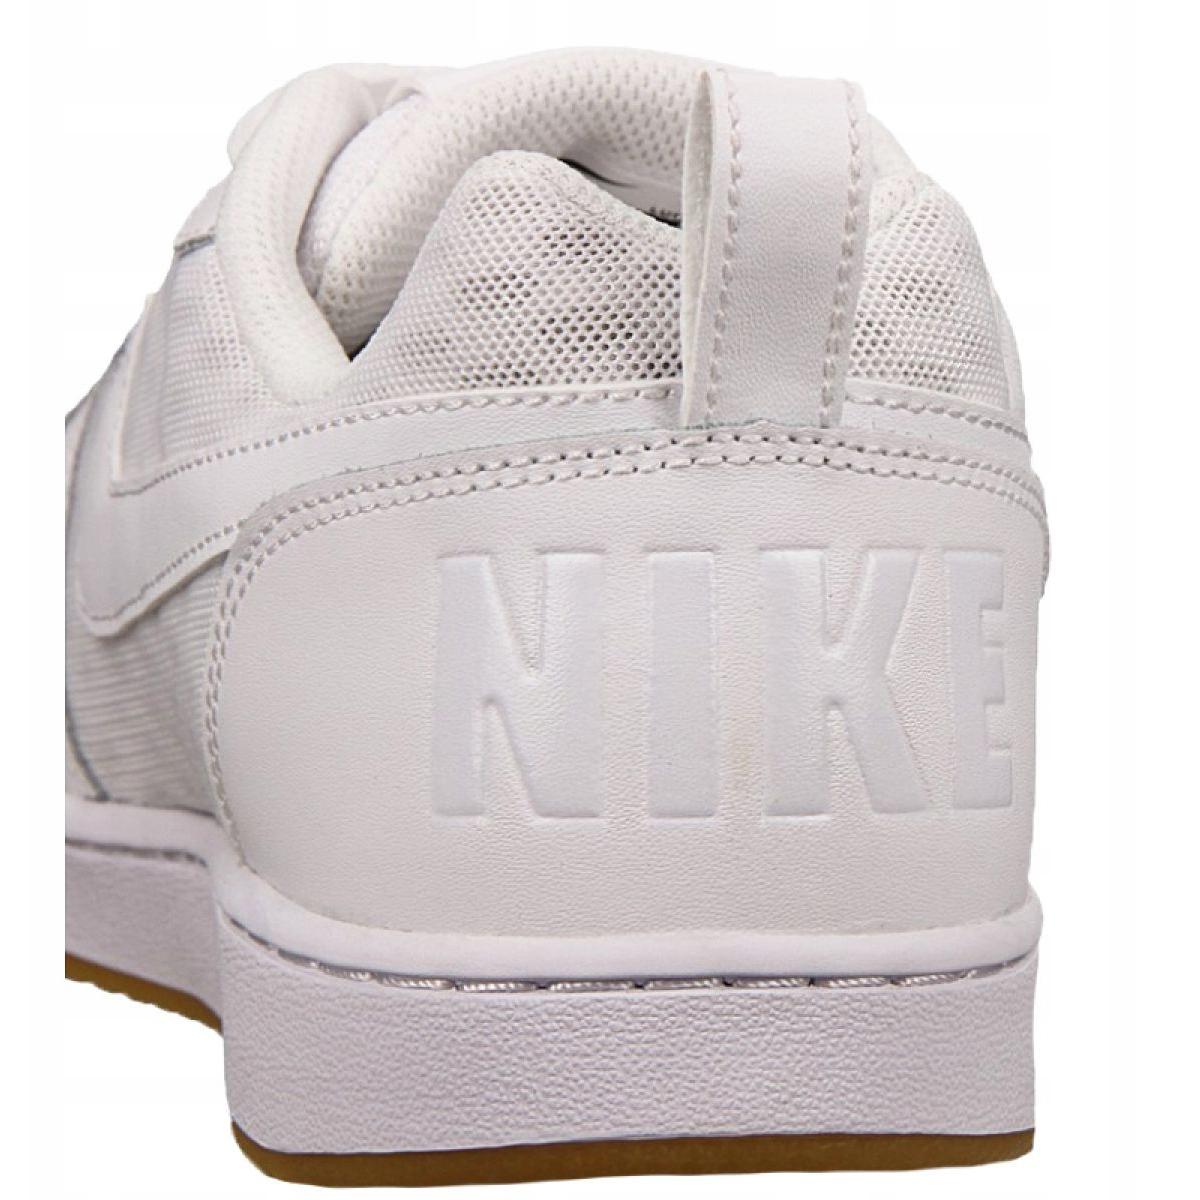 Dettagli su Scarpe Nike Court Borough Low Se M 916760 101 bianco